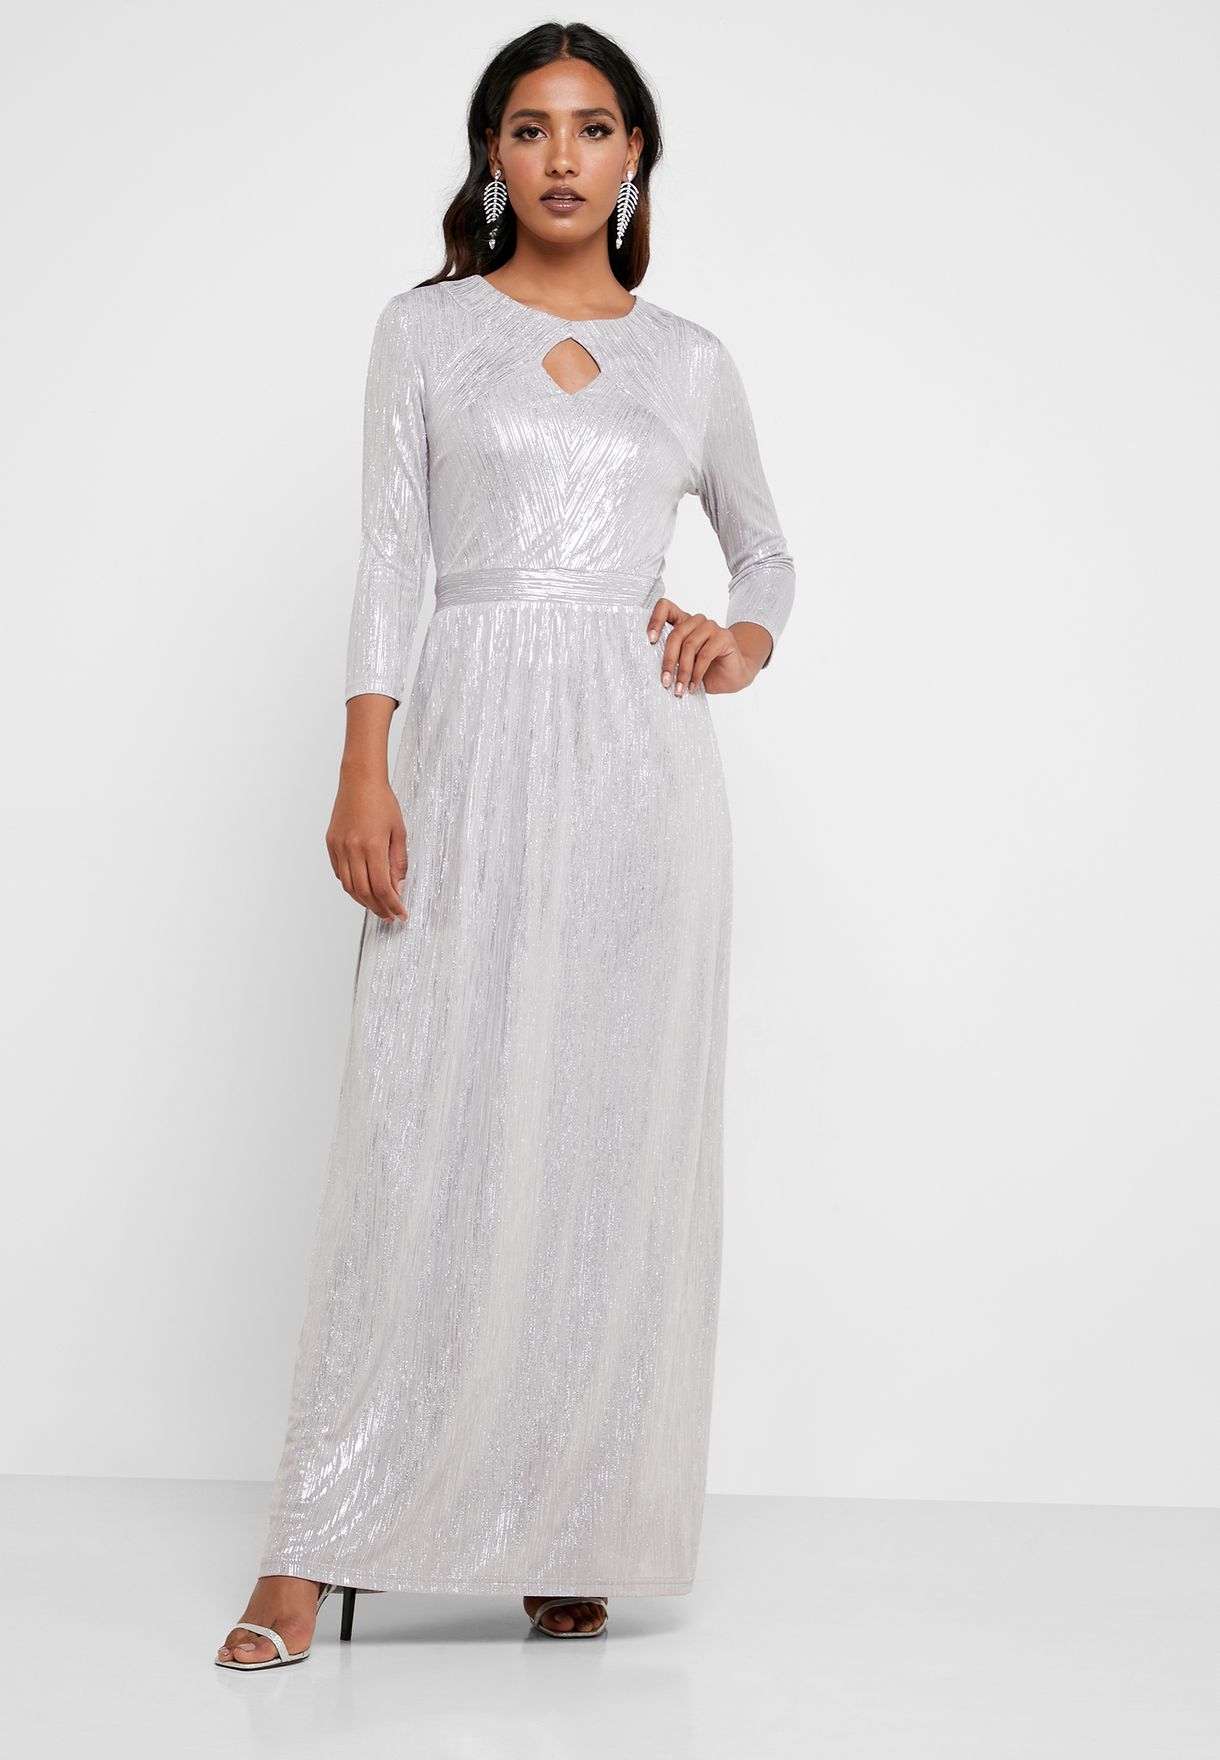 Buy Mela London Grey Shimmer Keyhole Dress For Women, Uae 19928at64ukp